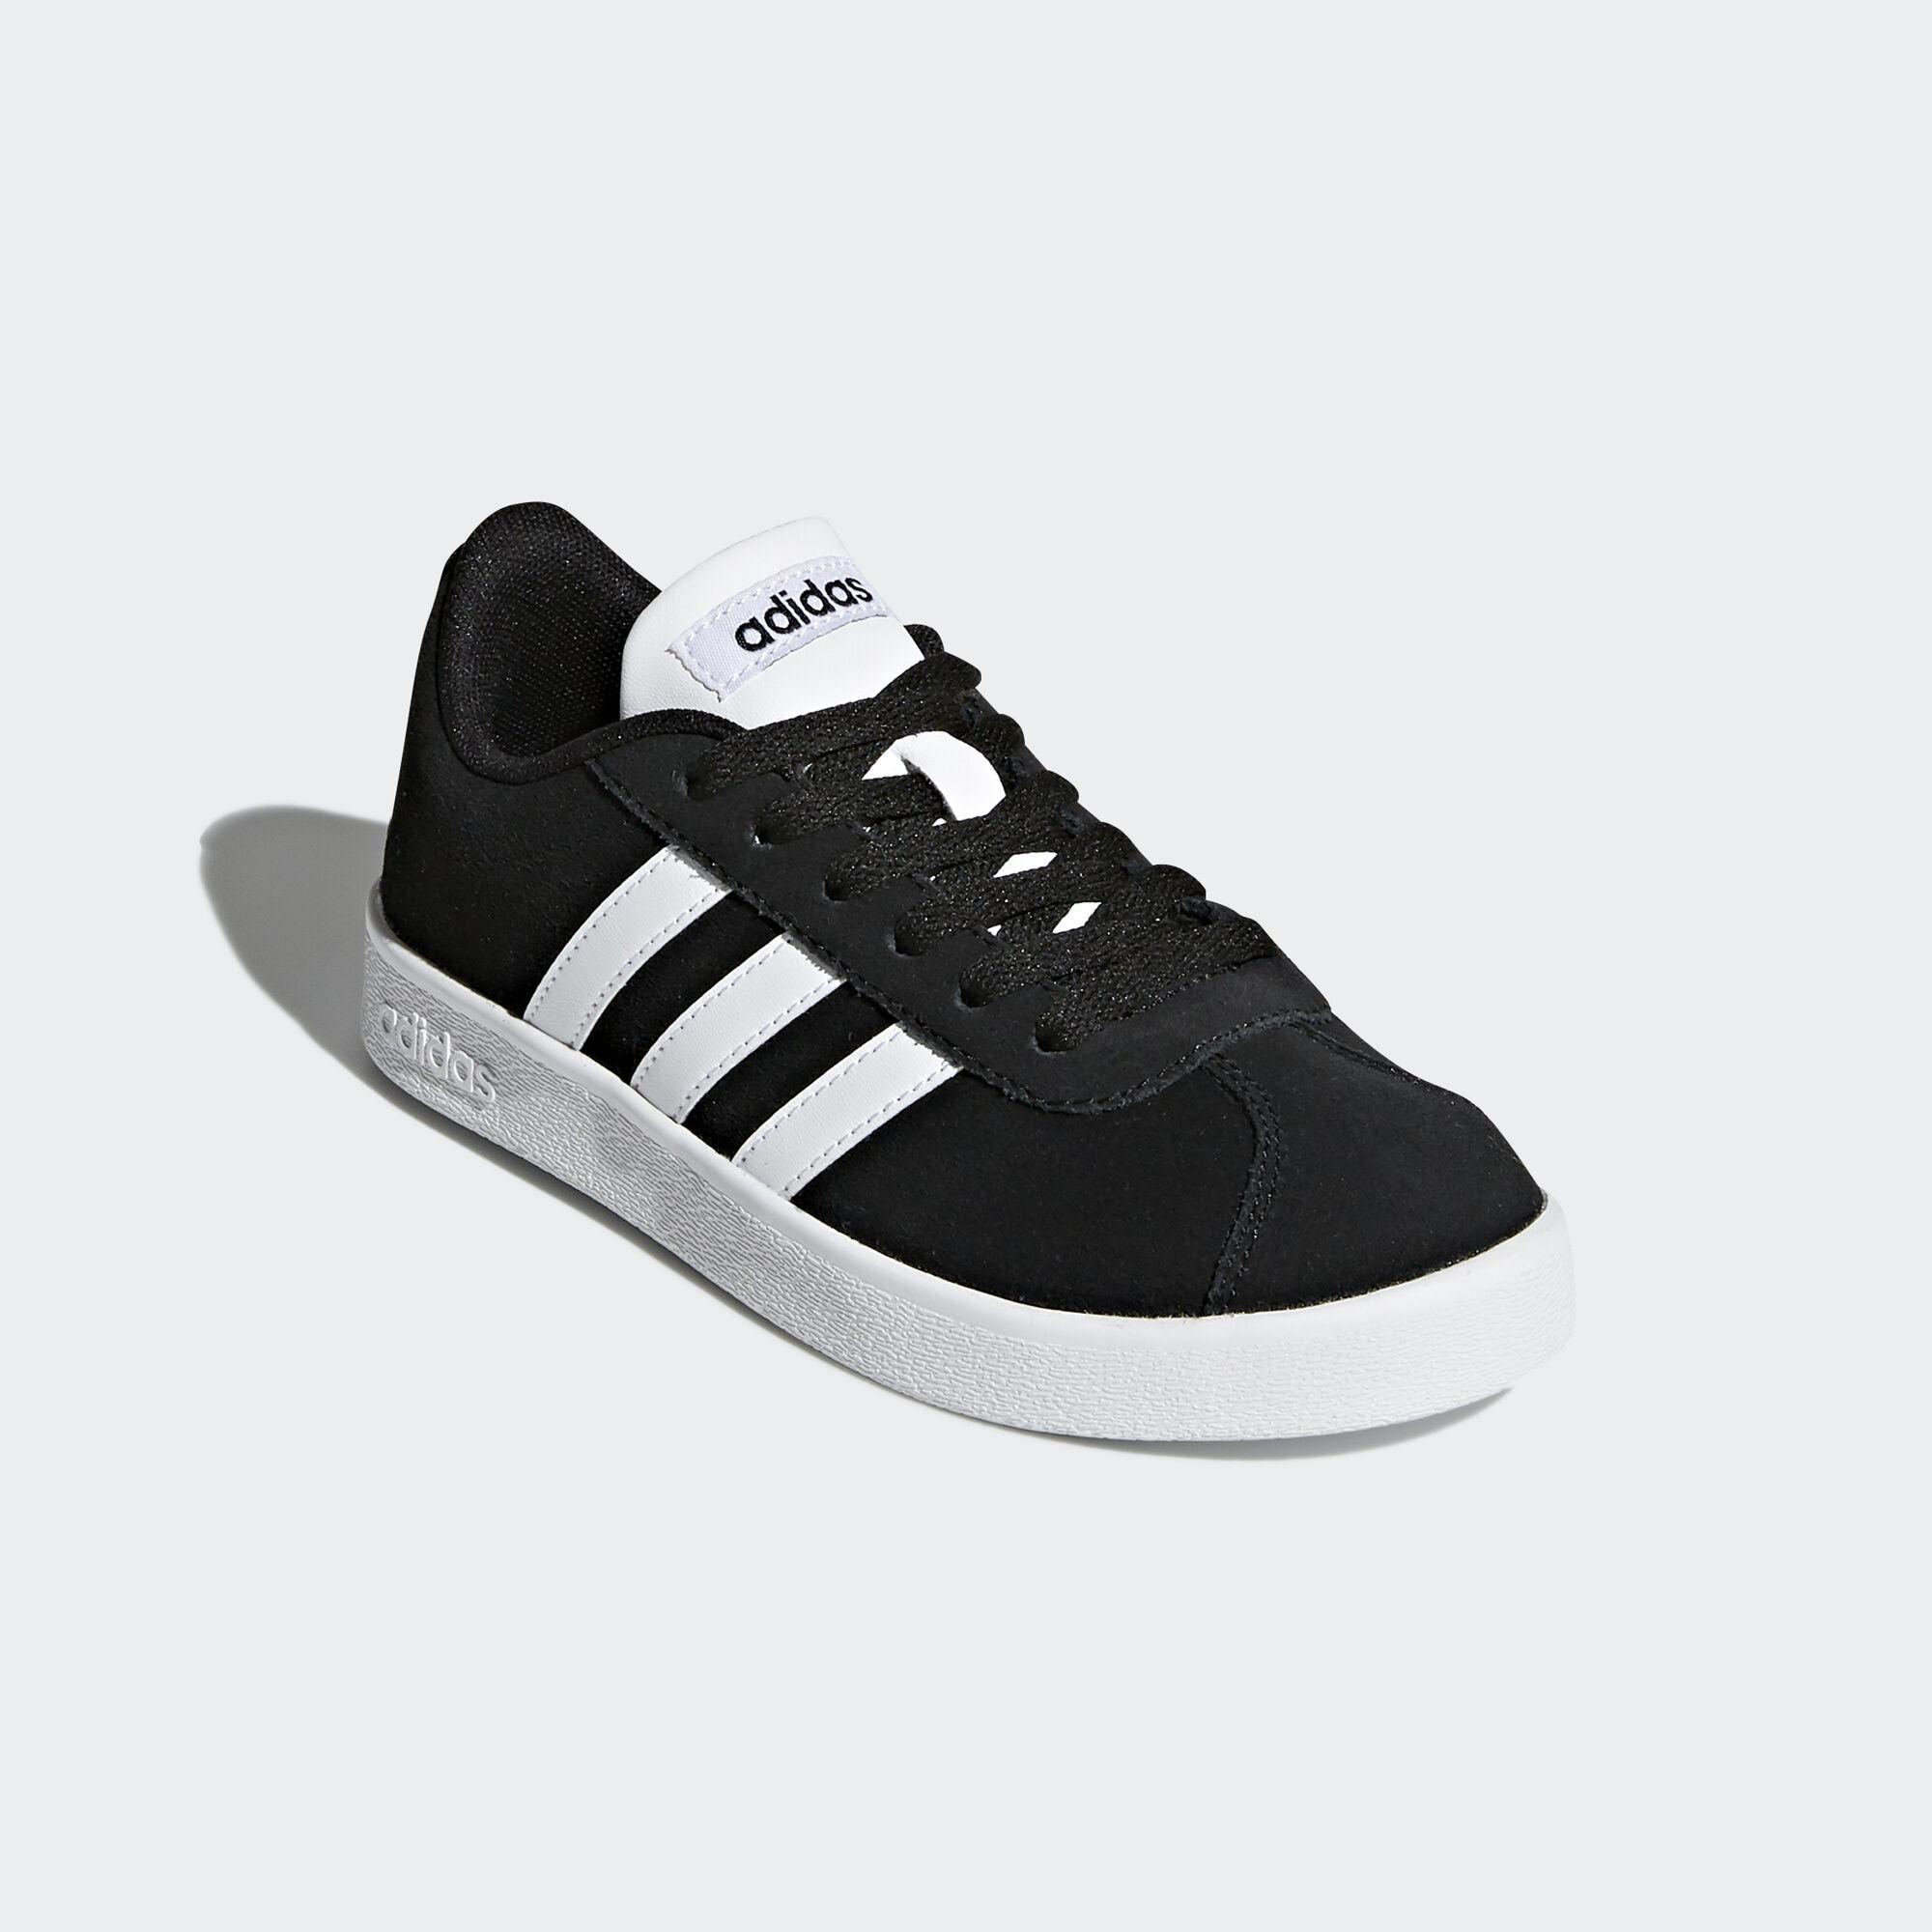 adidas-VL-Court-2-0-Shoes-Kids-039